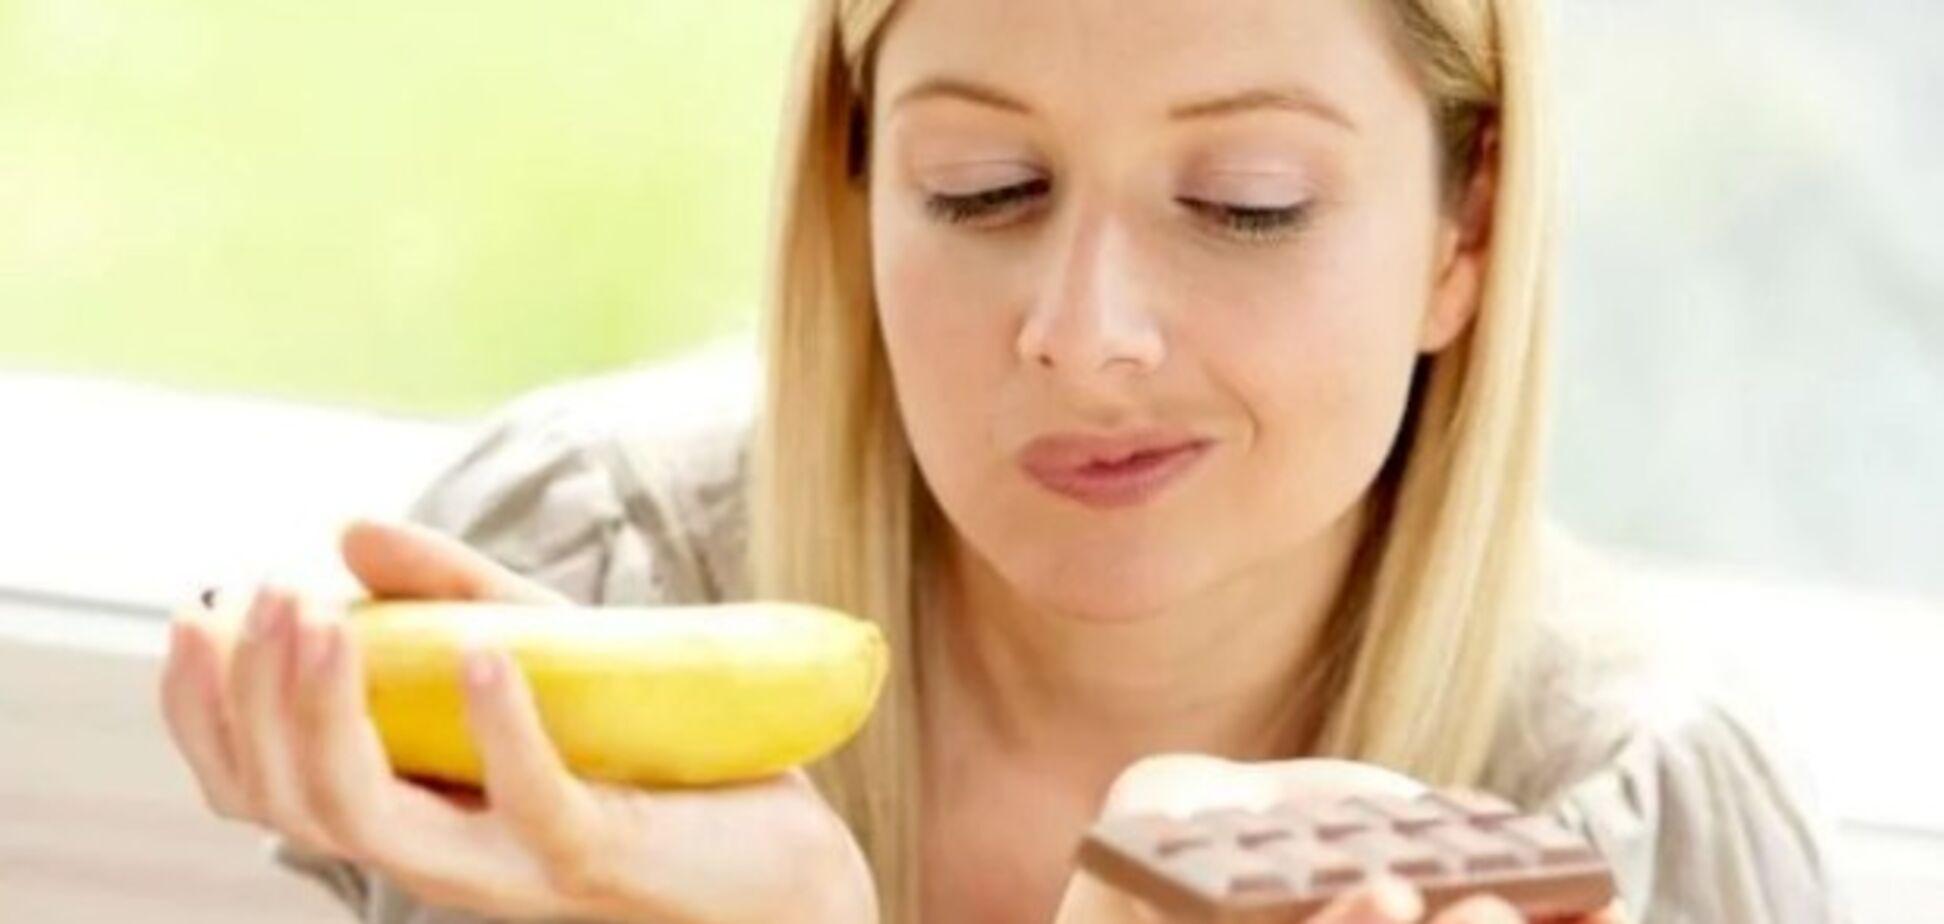 Щоб худнути - треба їсти